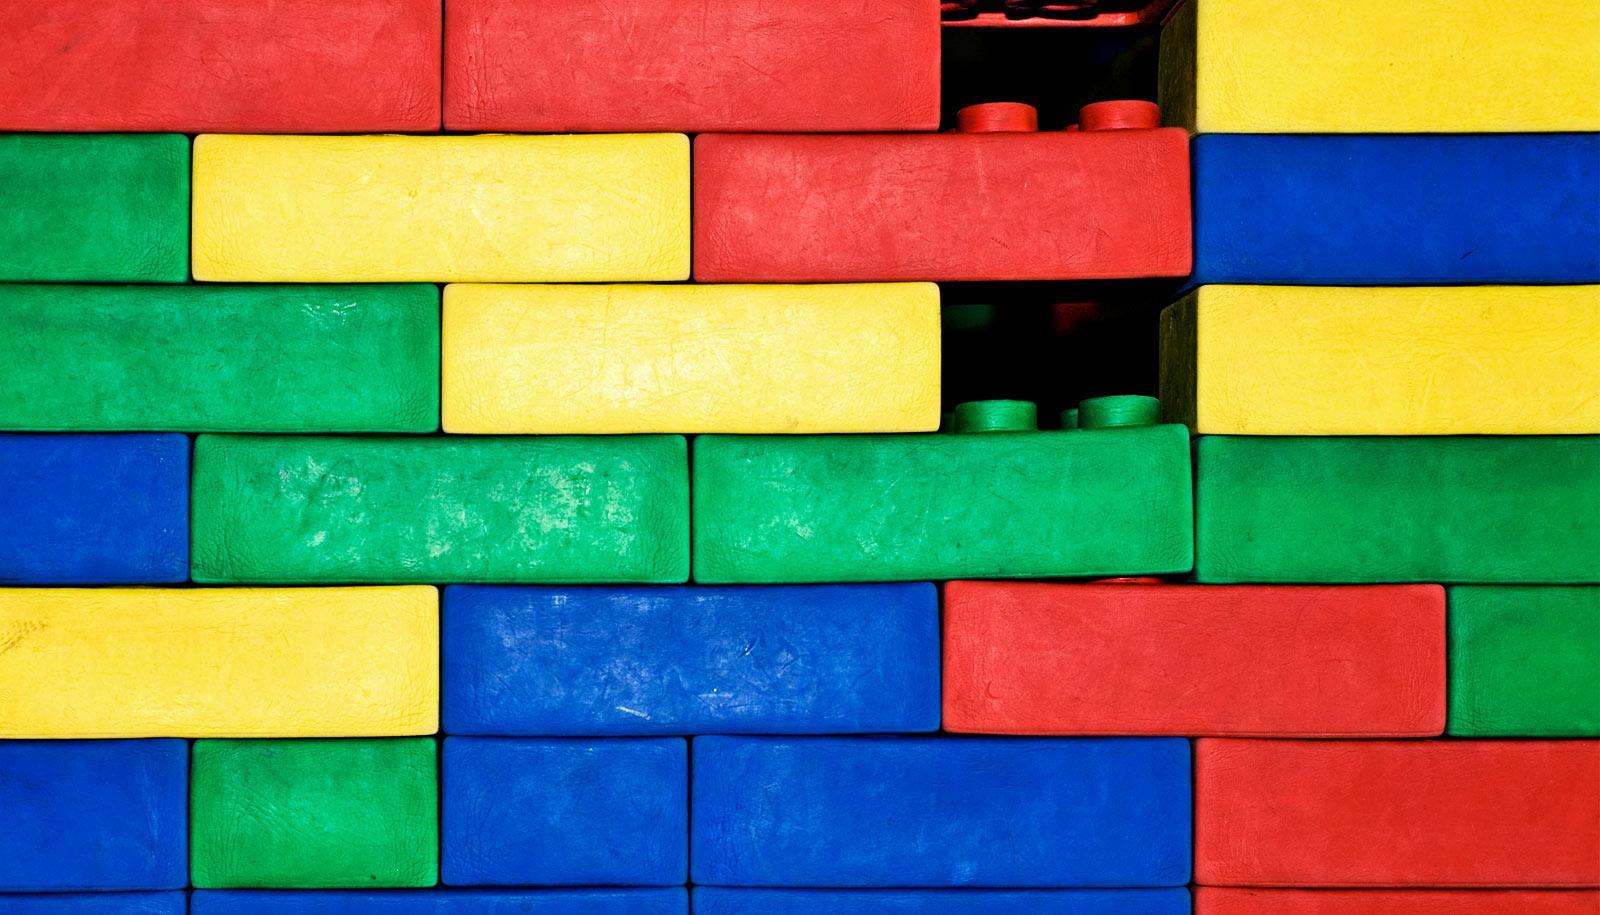 lego brick wall (Epithelial tissues concept)